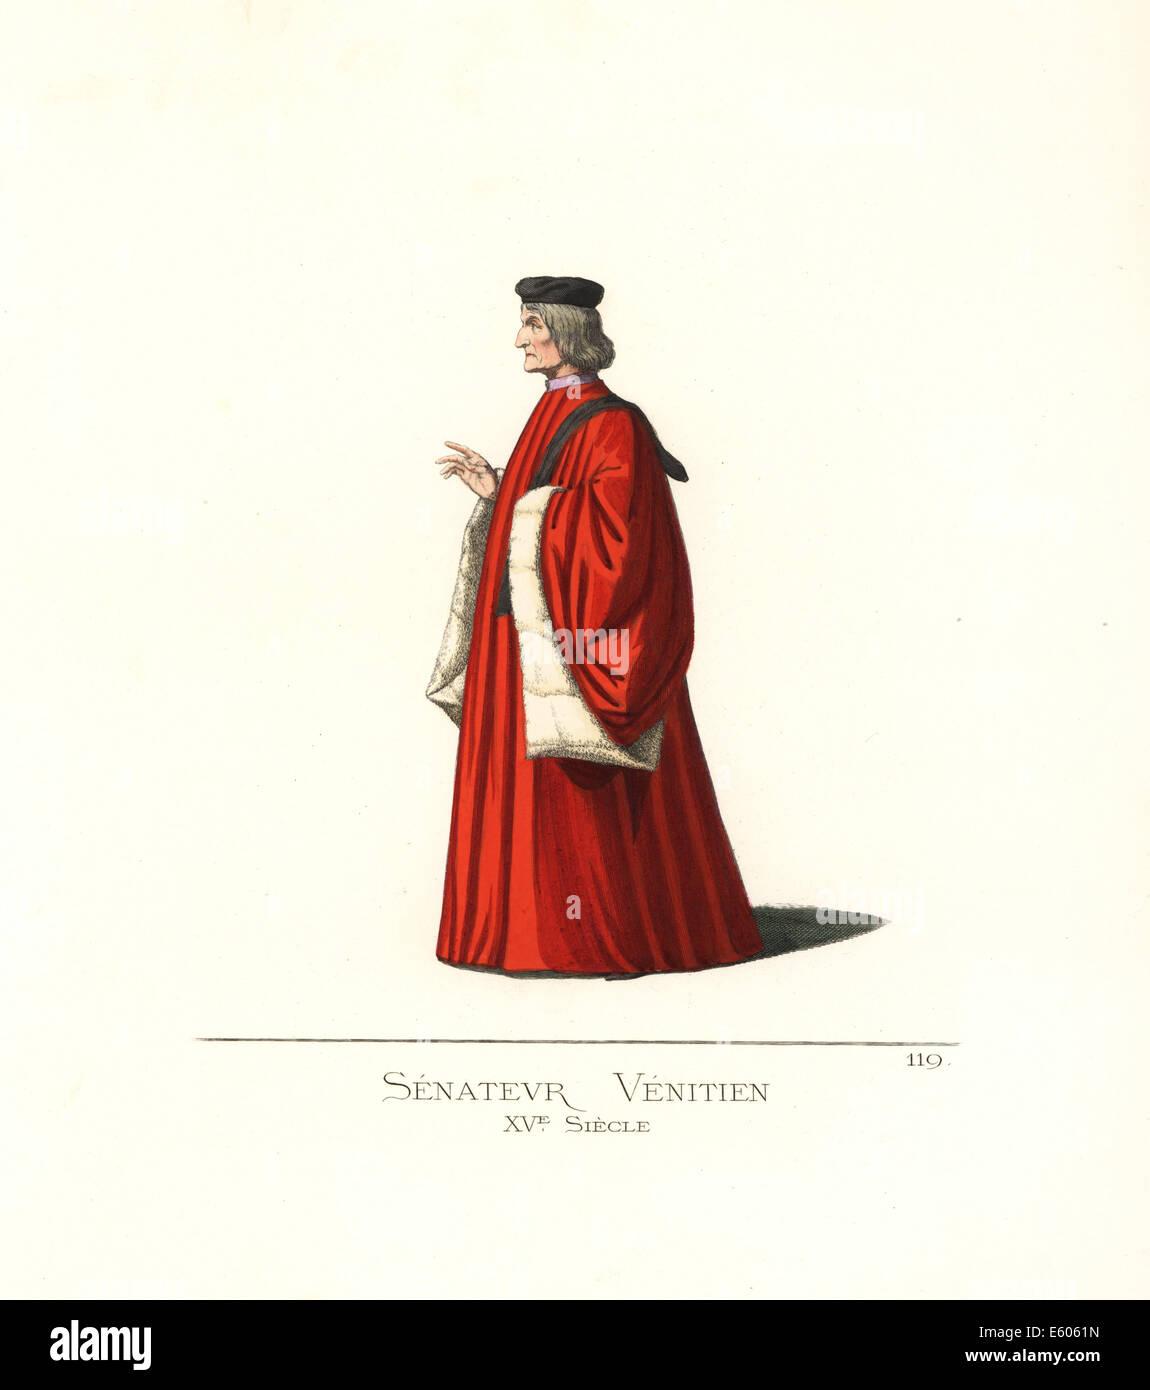 Venetian senator, 15th century. - Stock Image